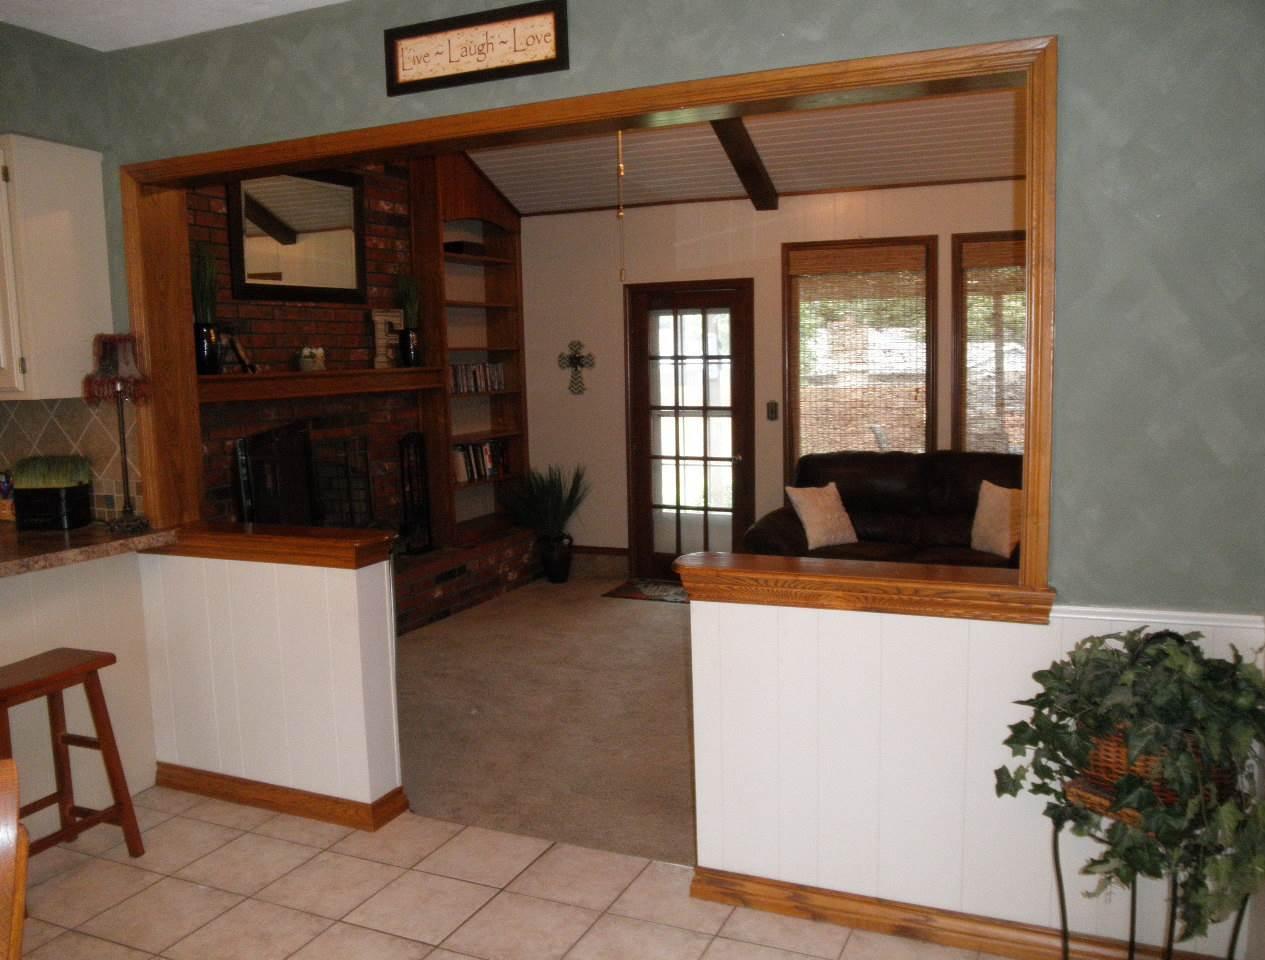 Sold Cross Sale W/ MLS | 2805 Ames  Ponca City, OK  10